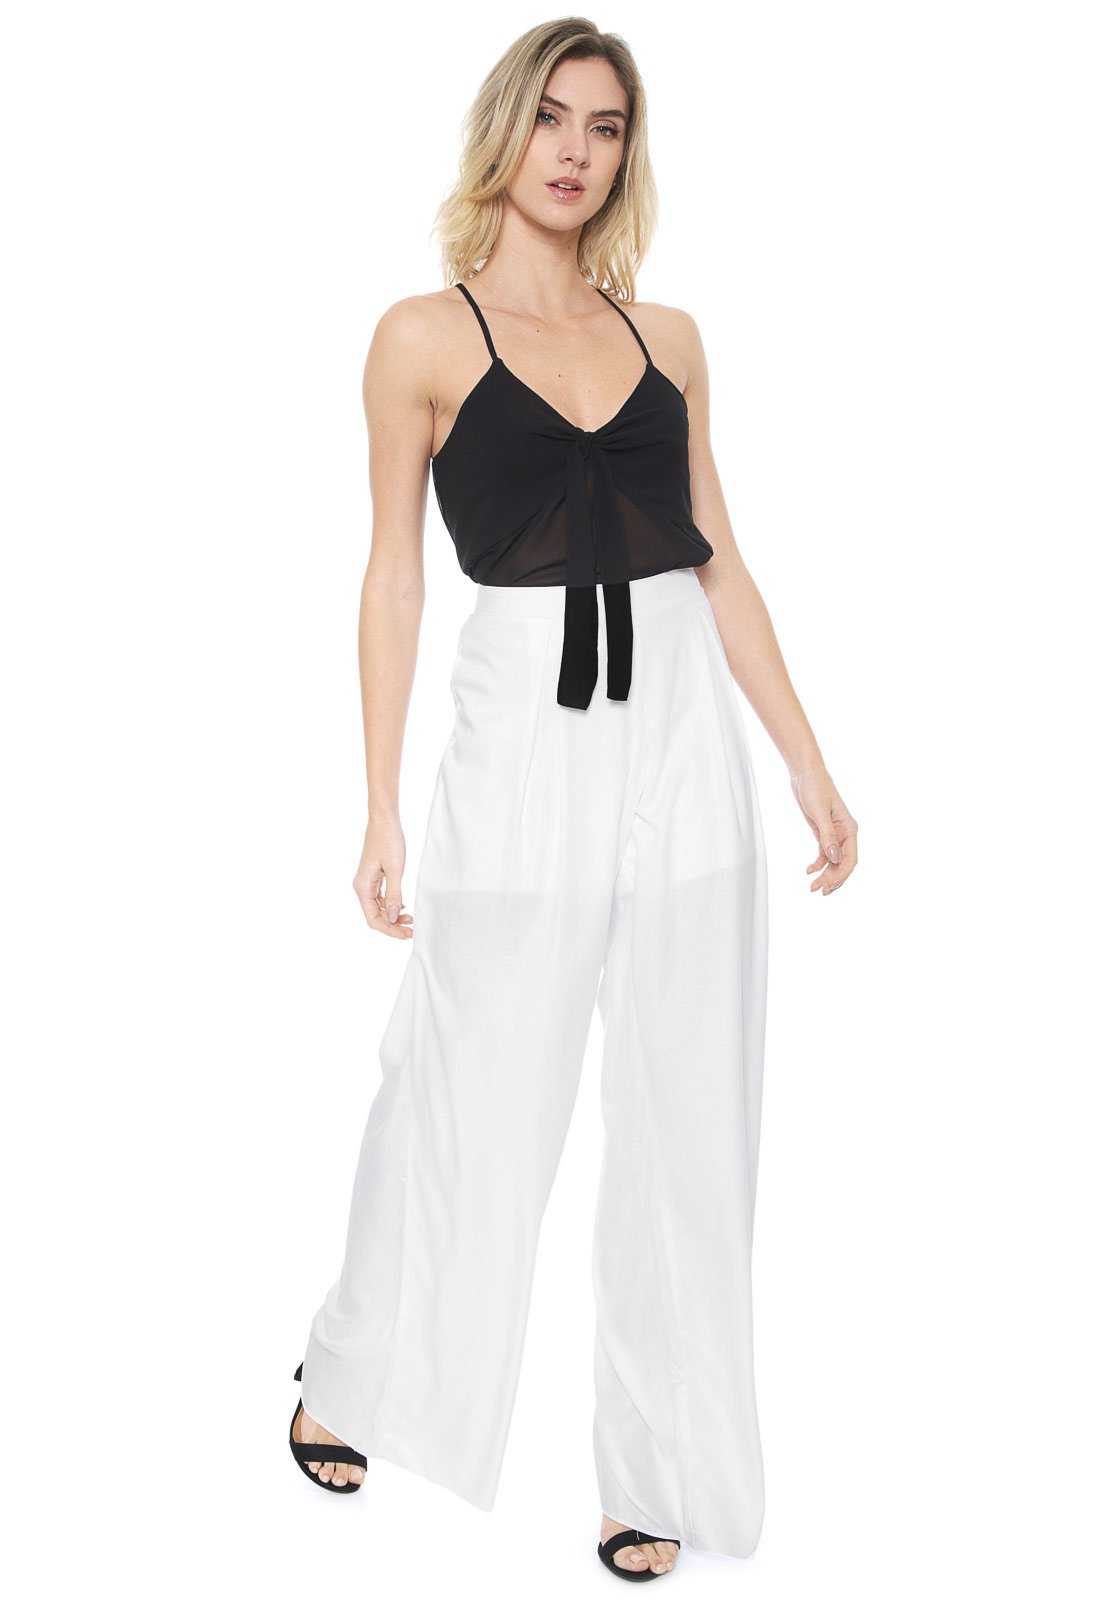 Calça Malwee Pantalona Básica Branca - Marca Malwee